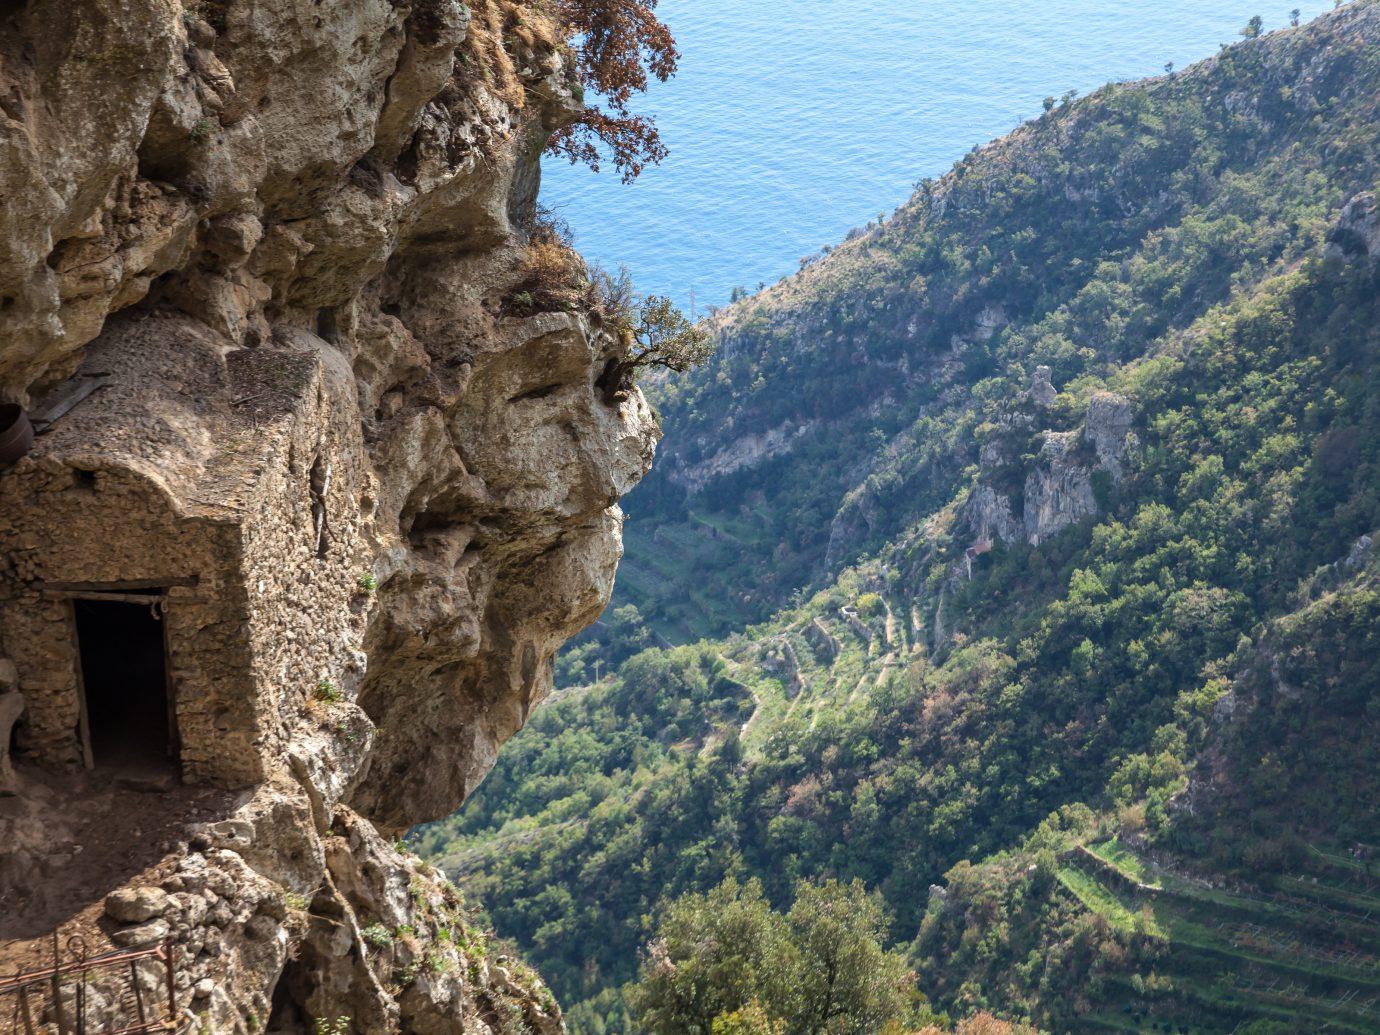 Part of Sentiero degli dei (Path of the Gods) from Agerola to Positano village